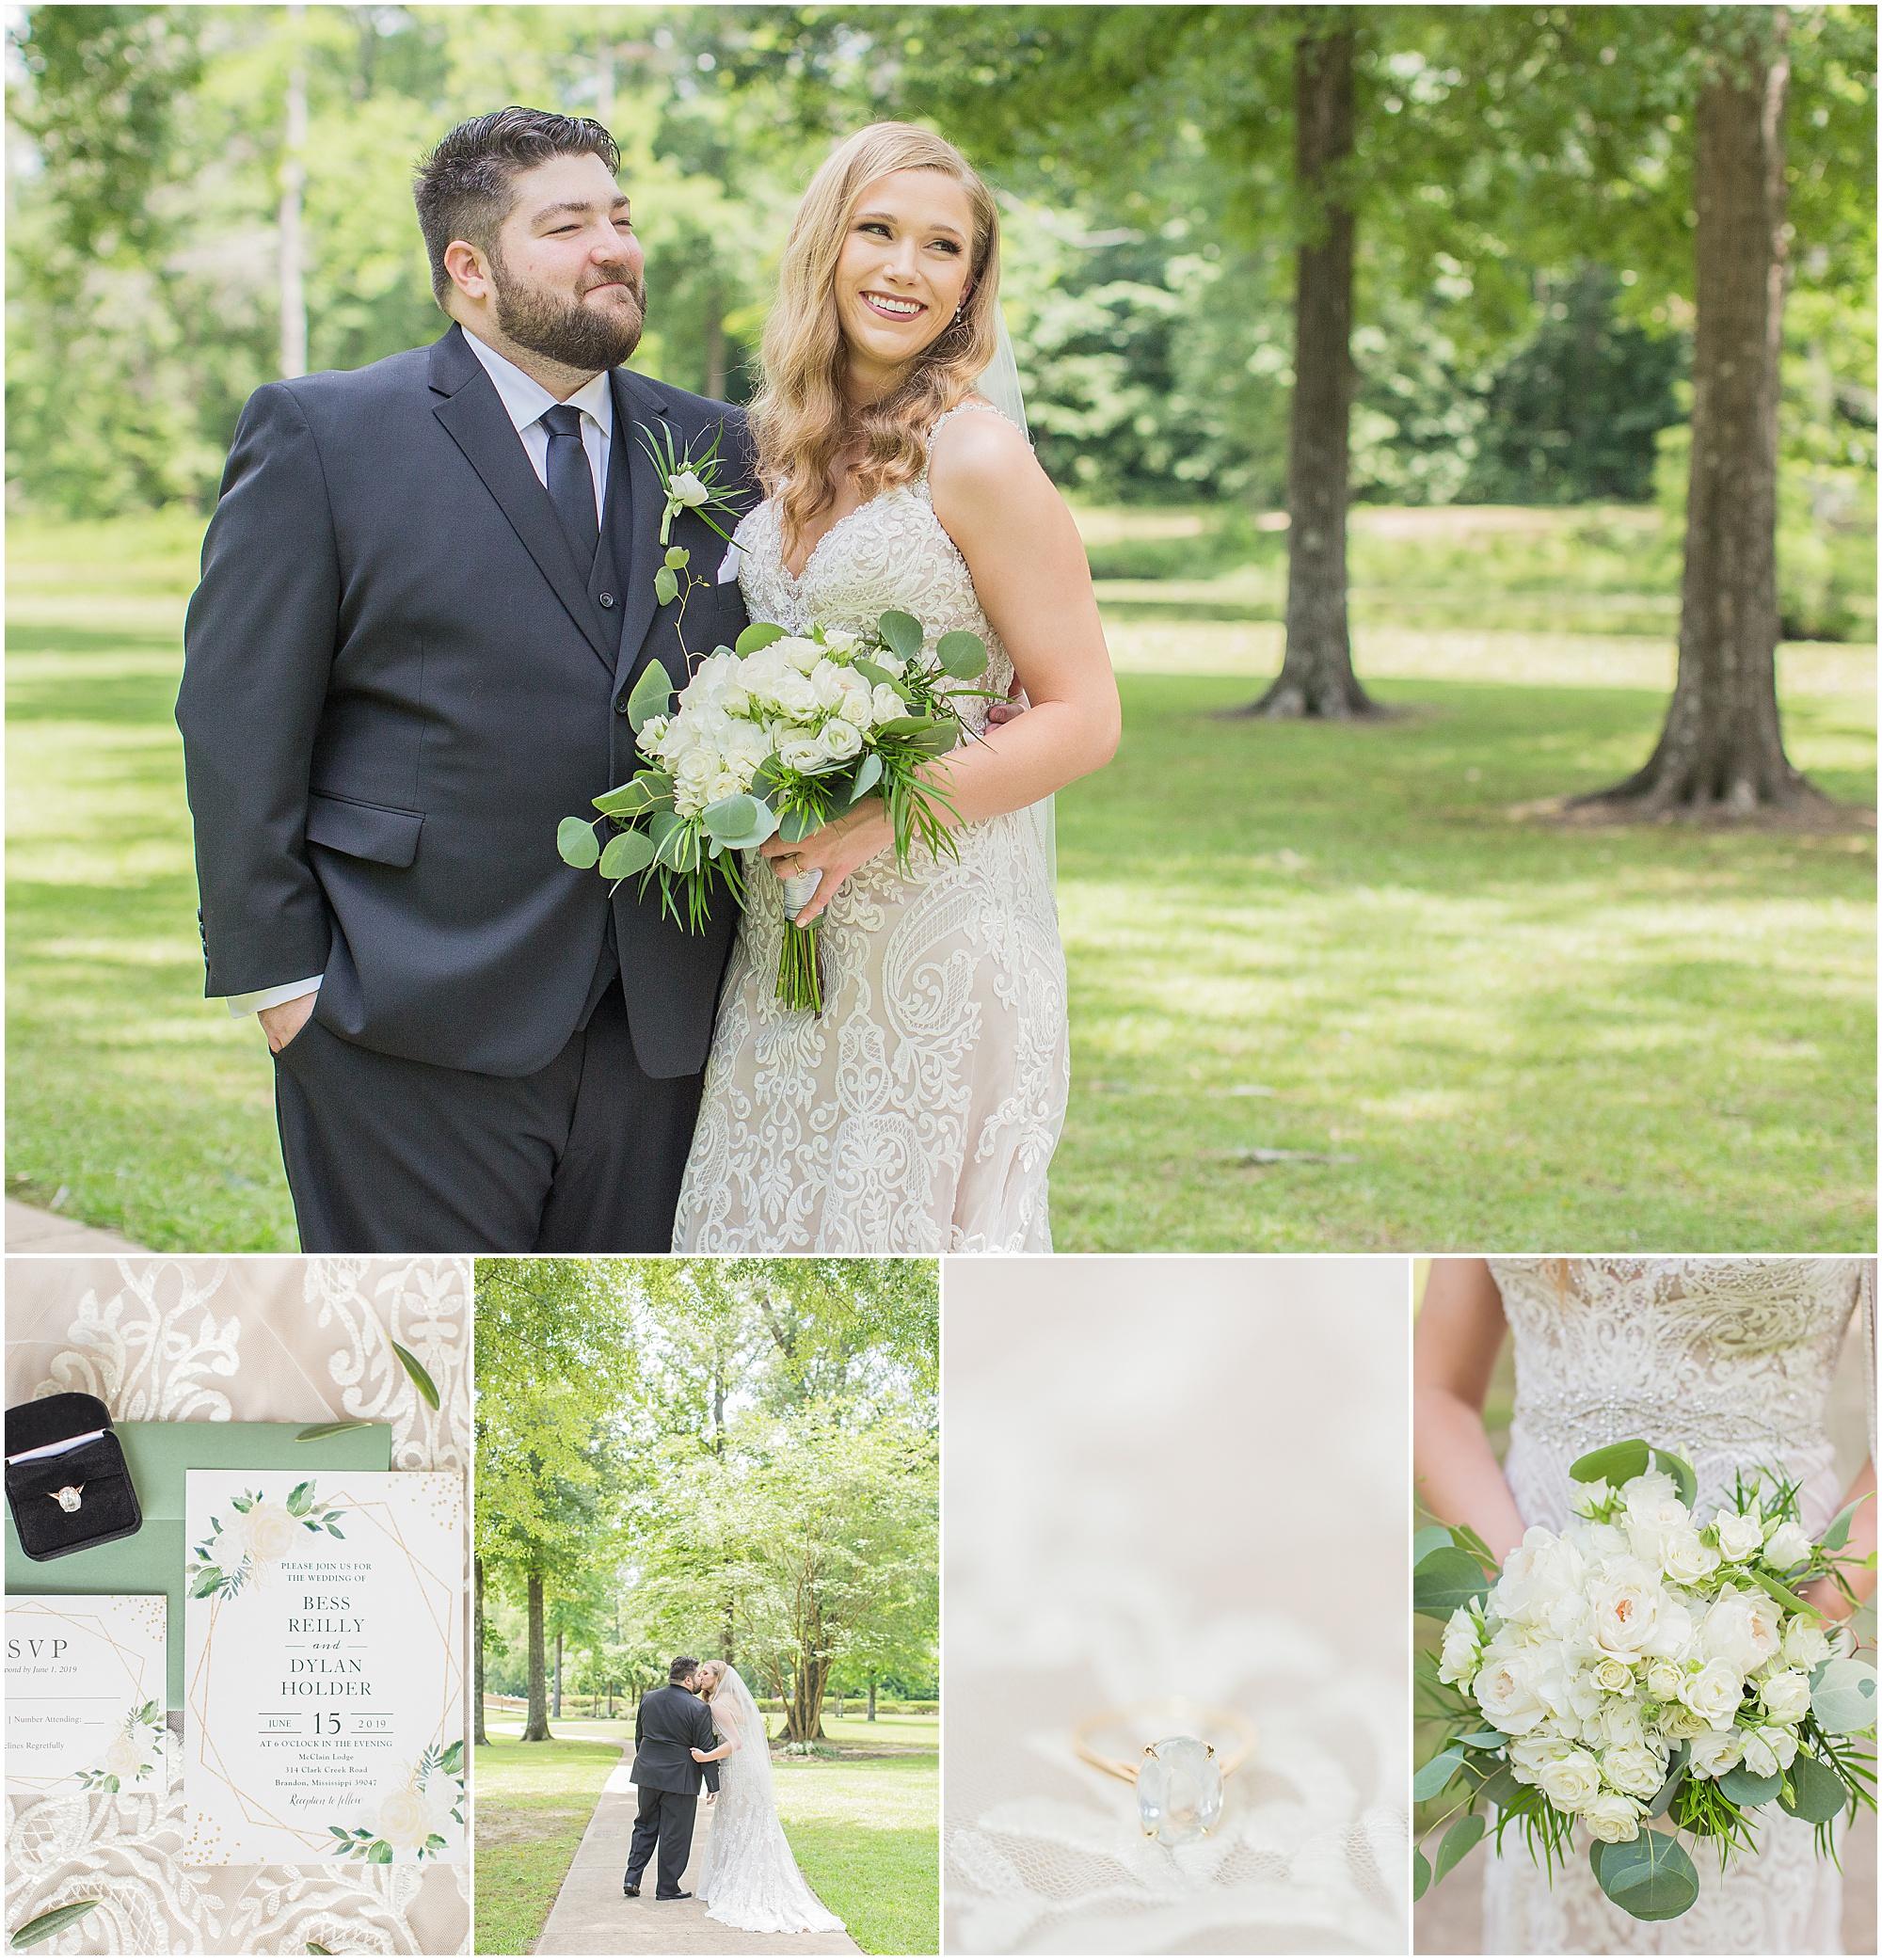 mississippi-summer-wedding-mcclain-lodge_0001.jpg